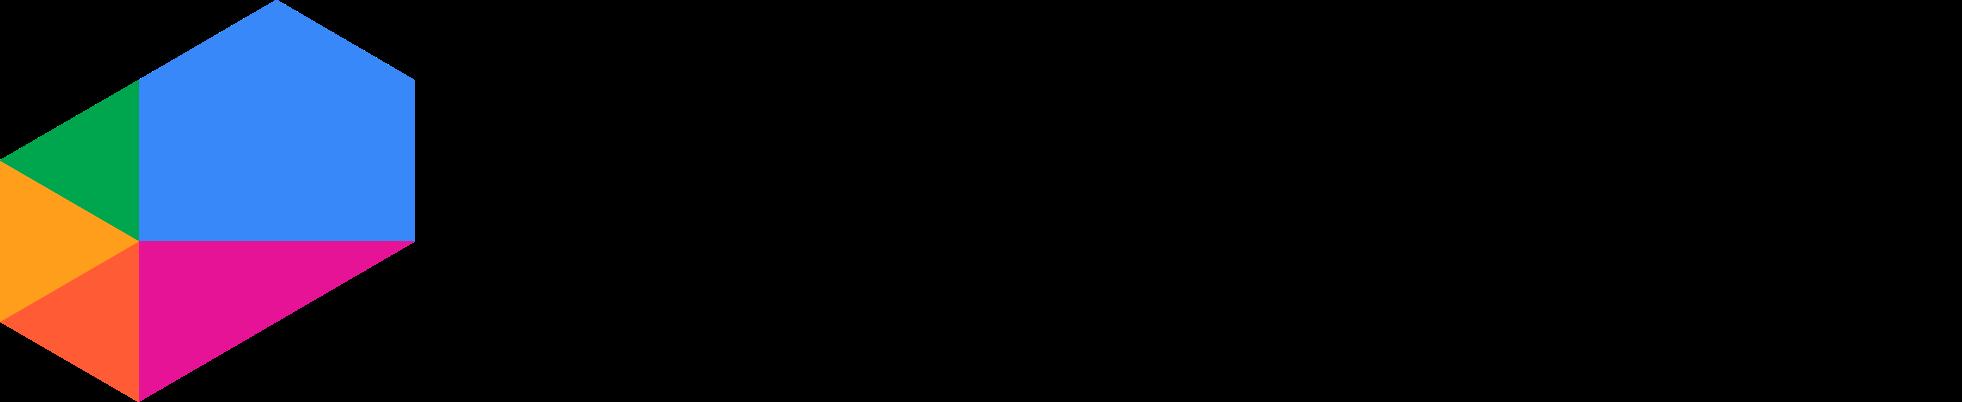 RentTrack logo